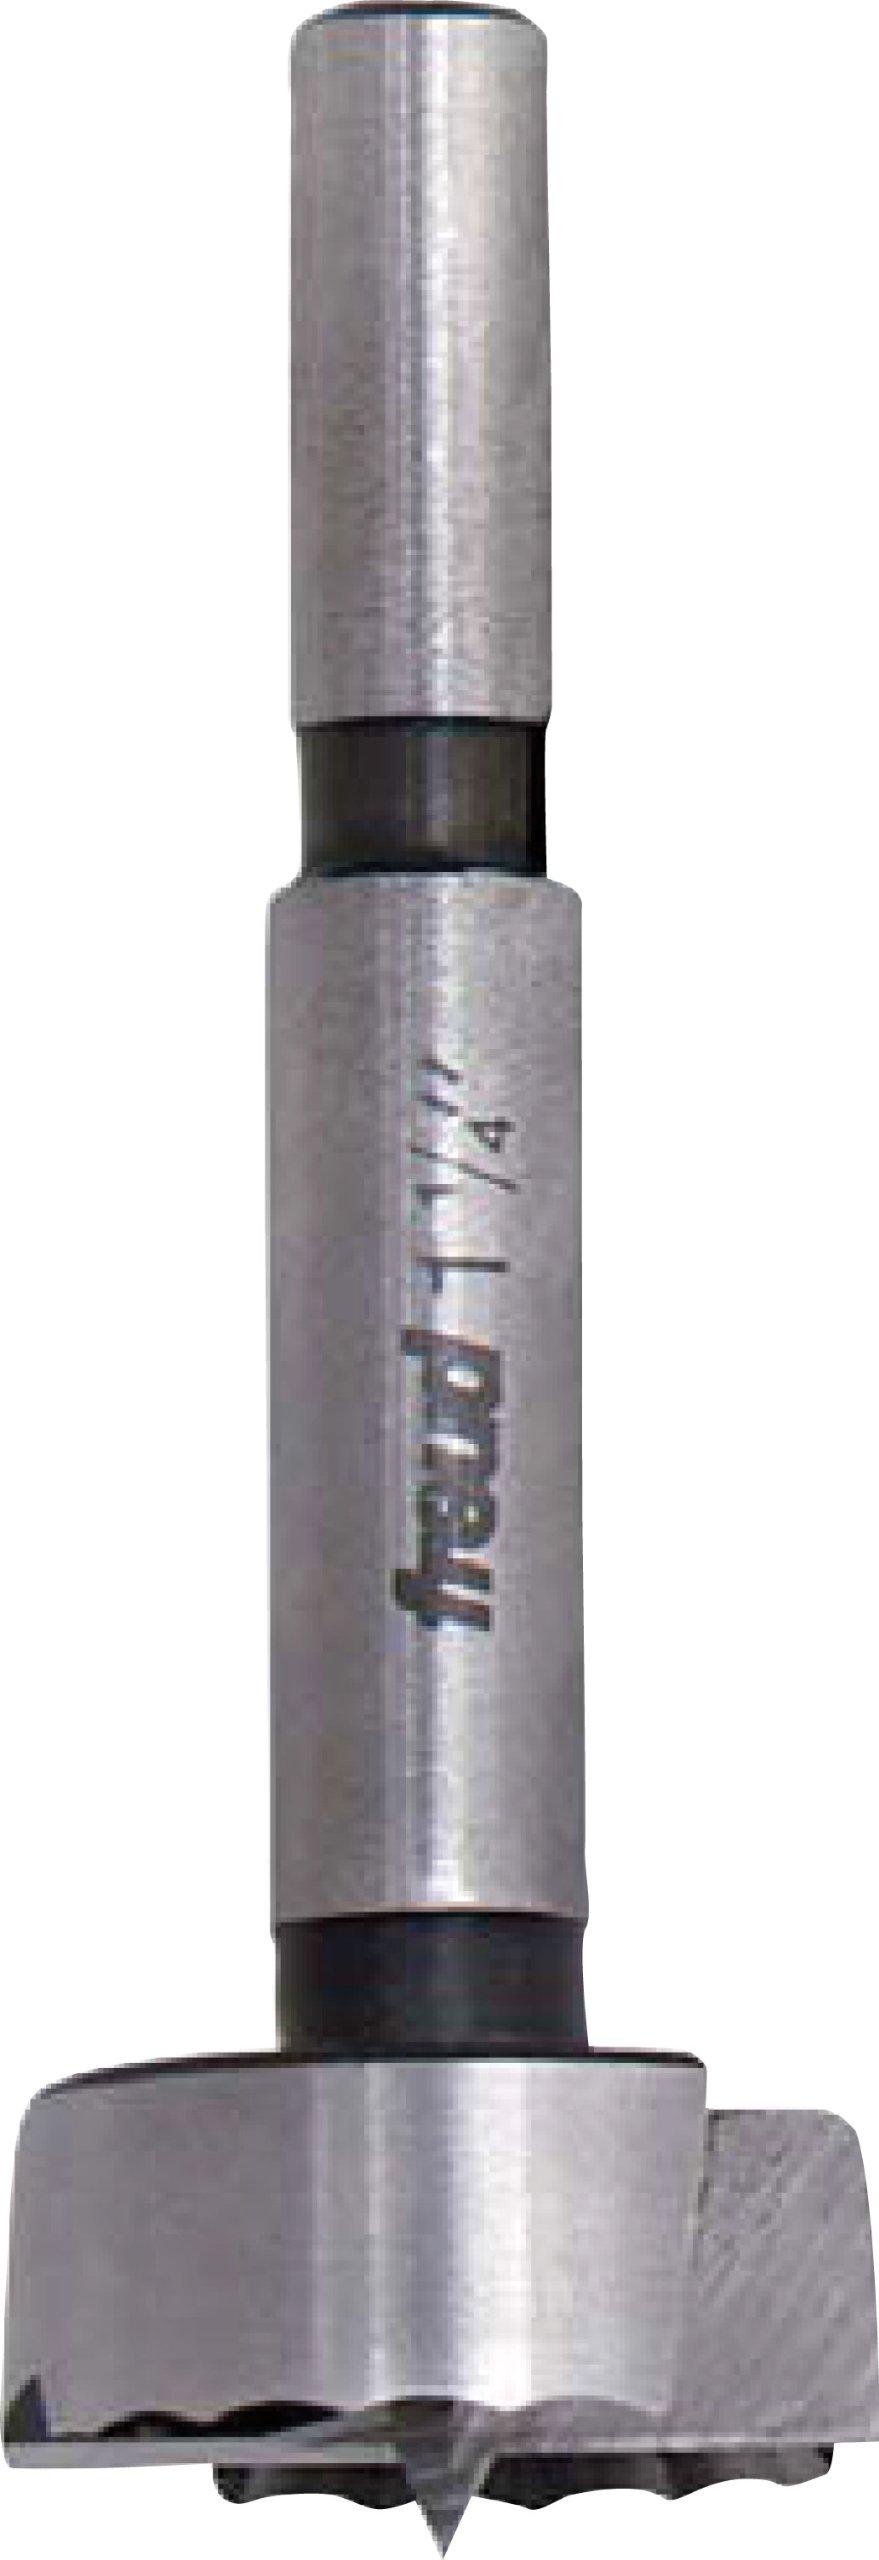 Freud PB-0035 9/16-Inch Precision Forester Bit